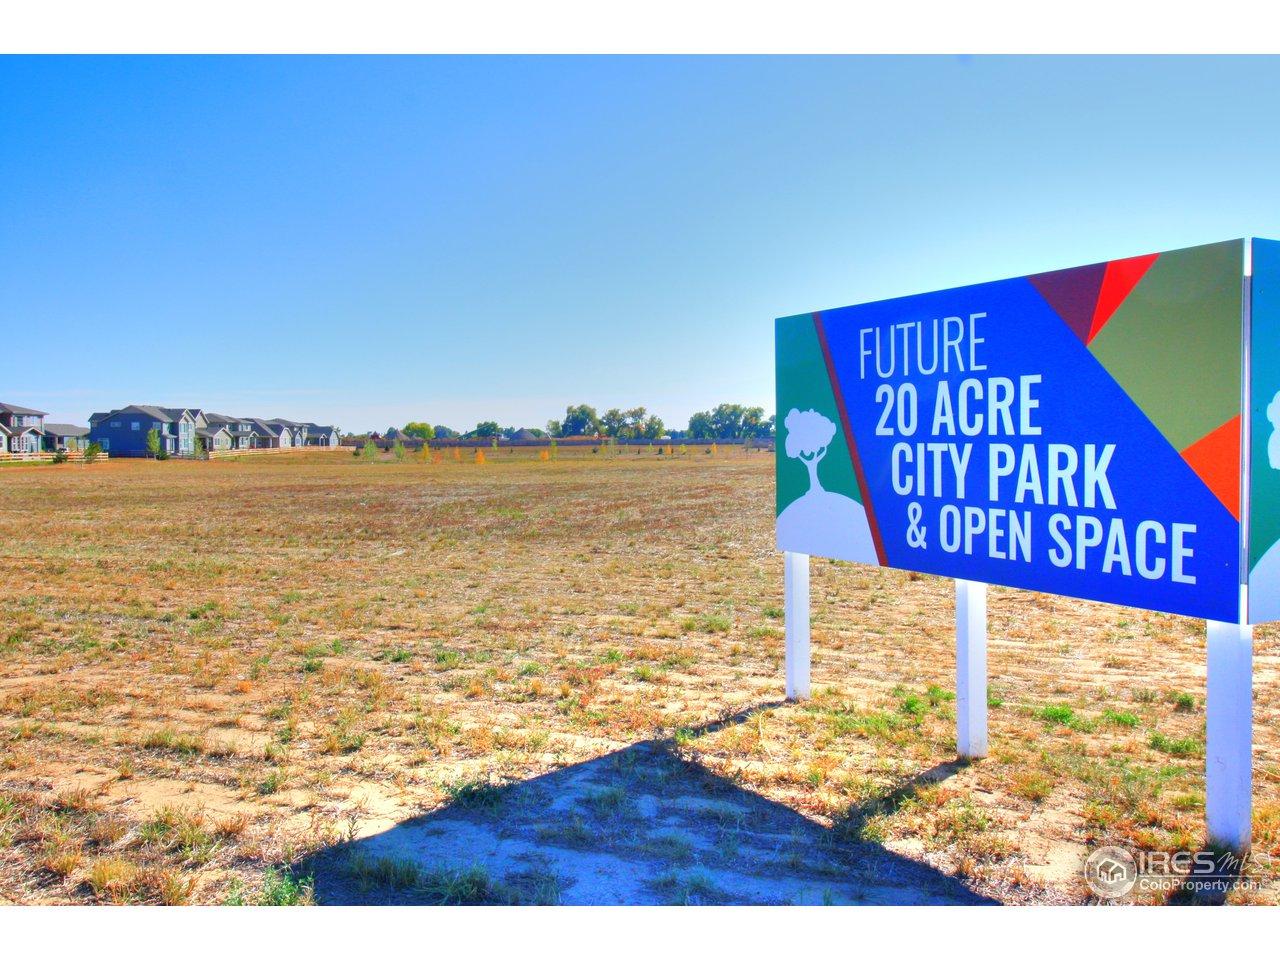 Planned future park